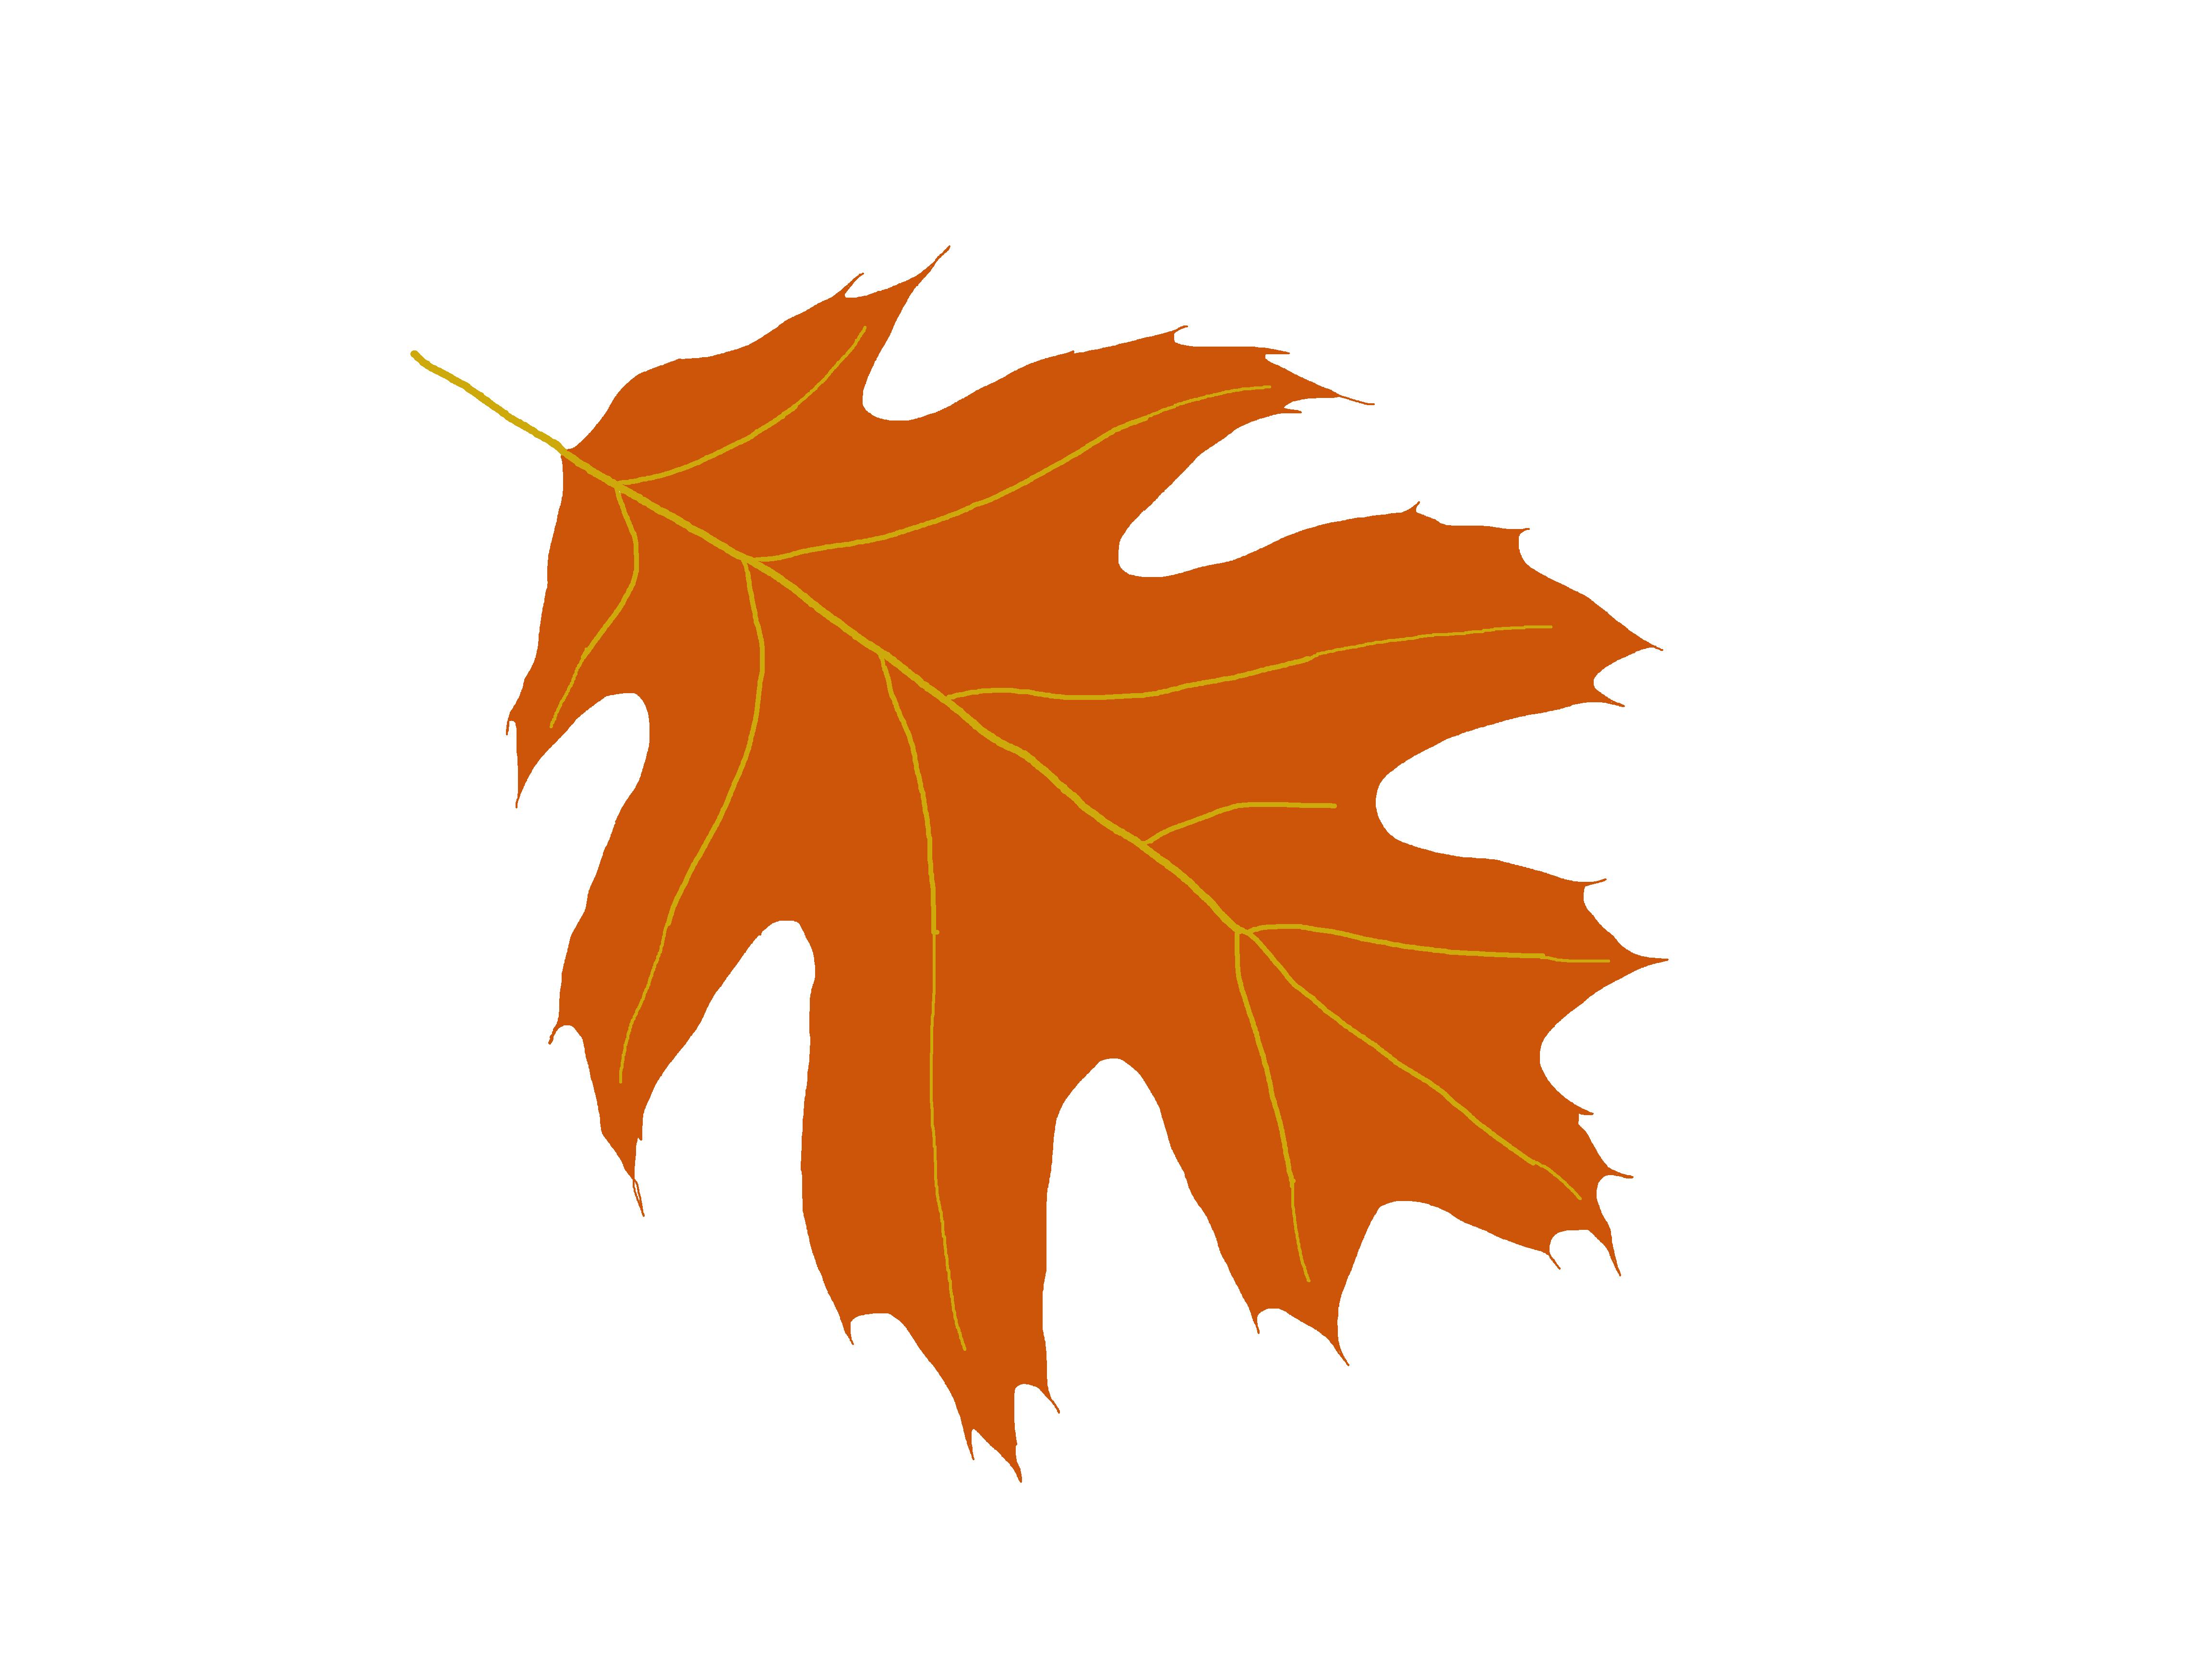 Oak tree leaf clipart - .